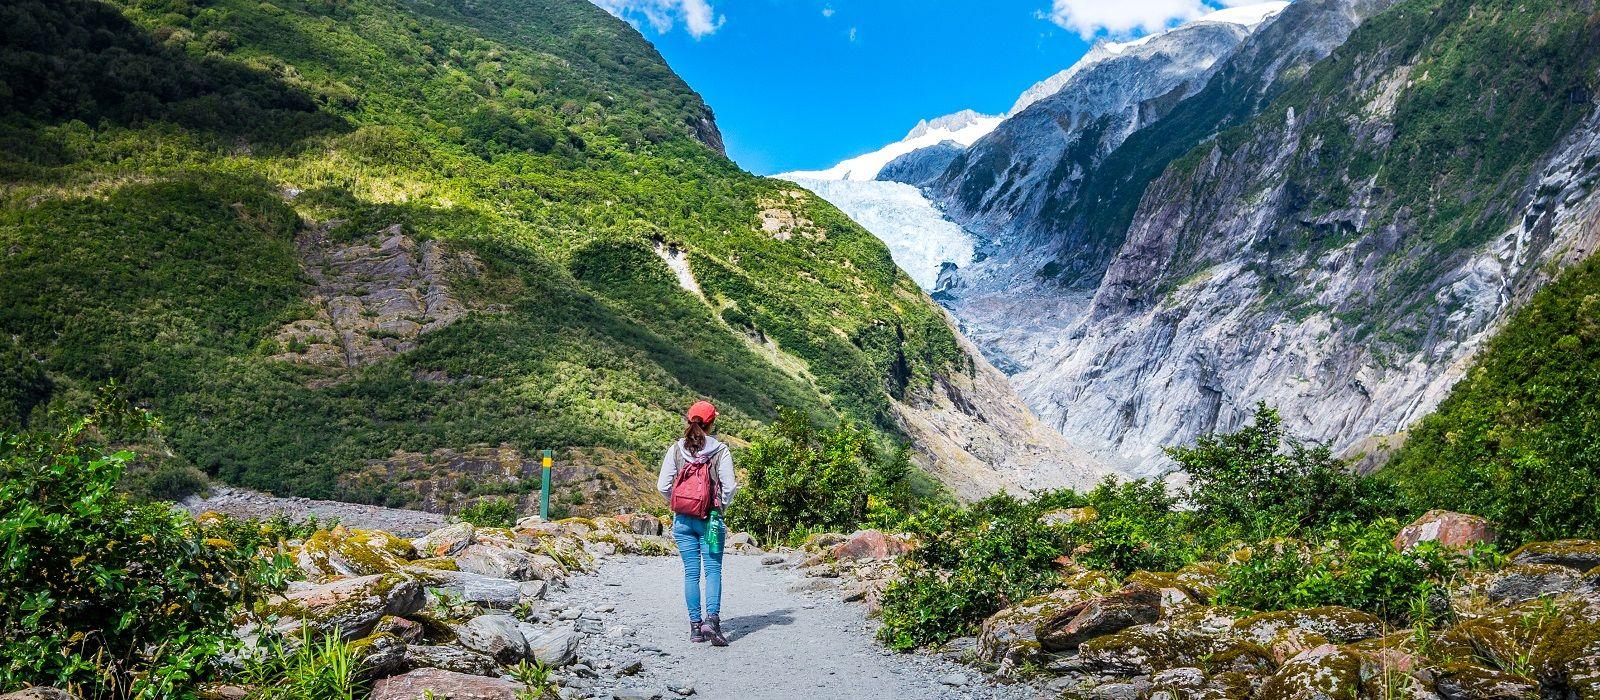 New Zealand: Landscapes, Culture and Beach Tour Trip 7